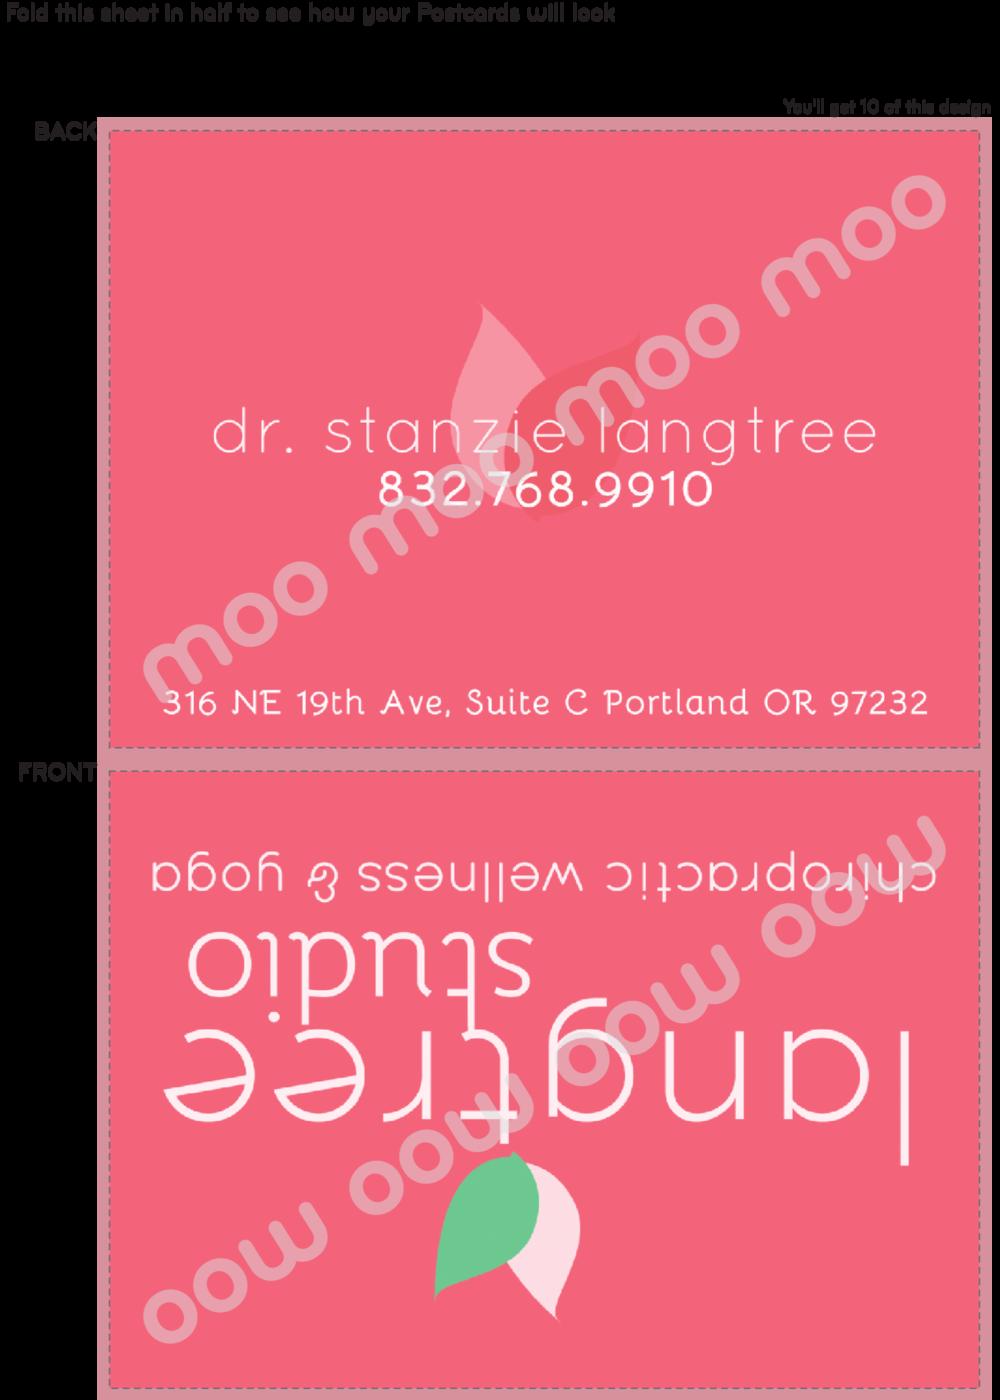 postcards (1)-2.png